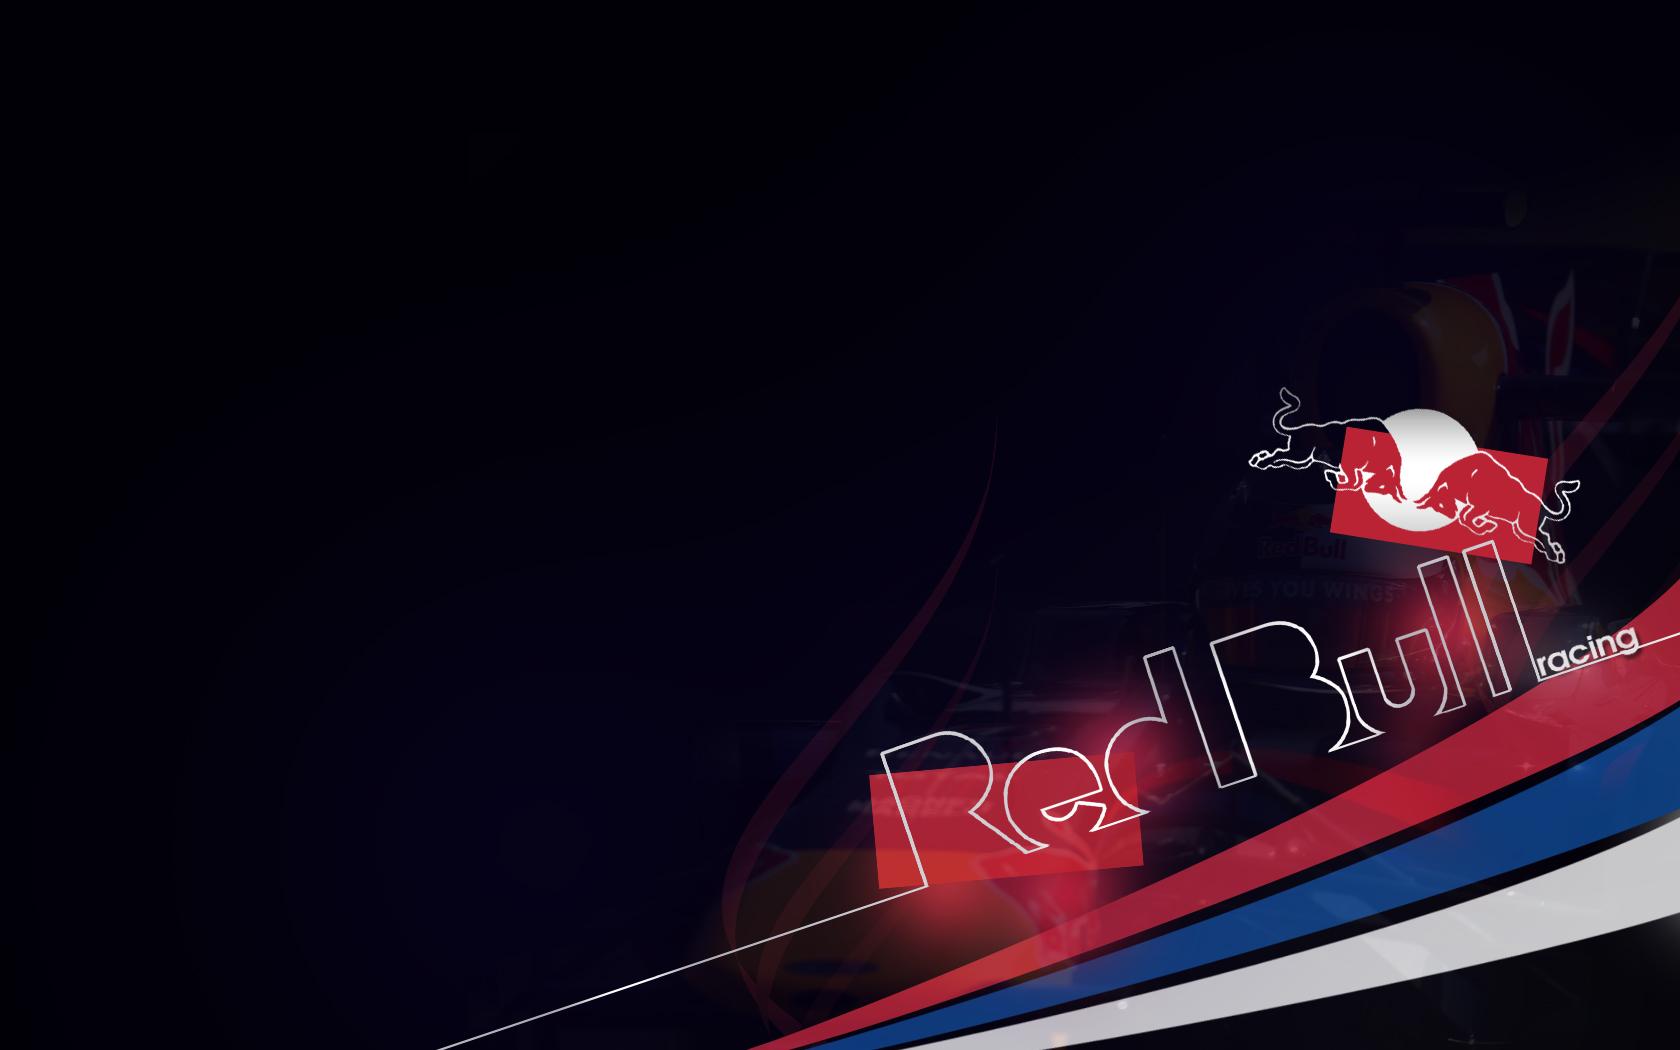 Red Bull Wallpapers Hd Muy Buenos Imágenes En Taringa